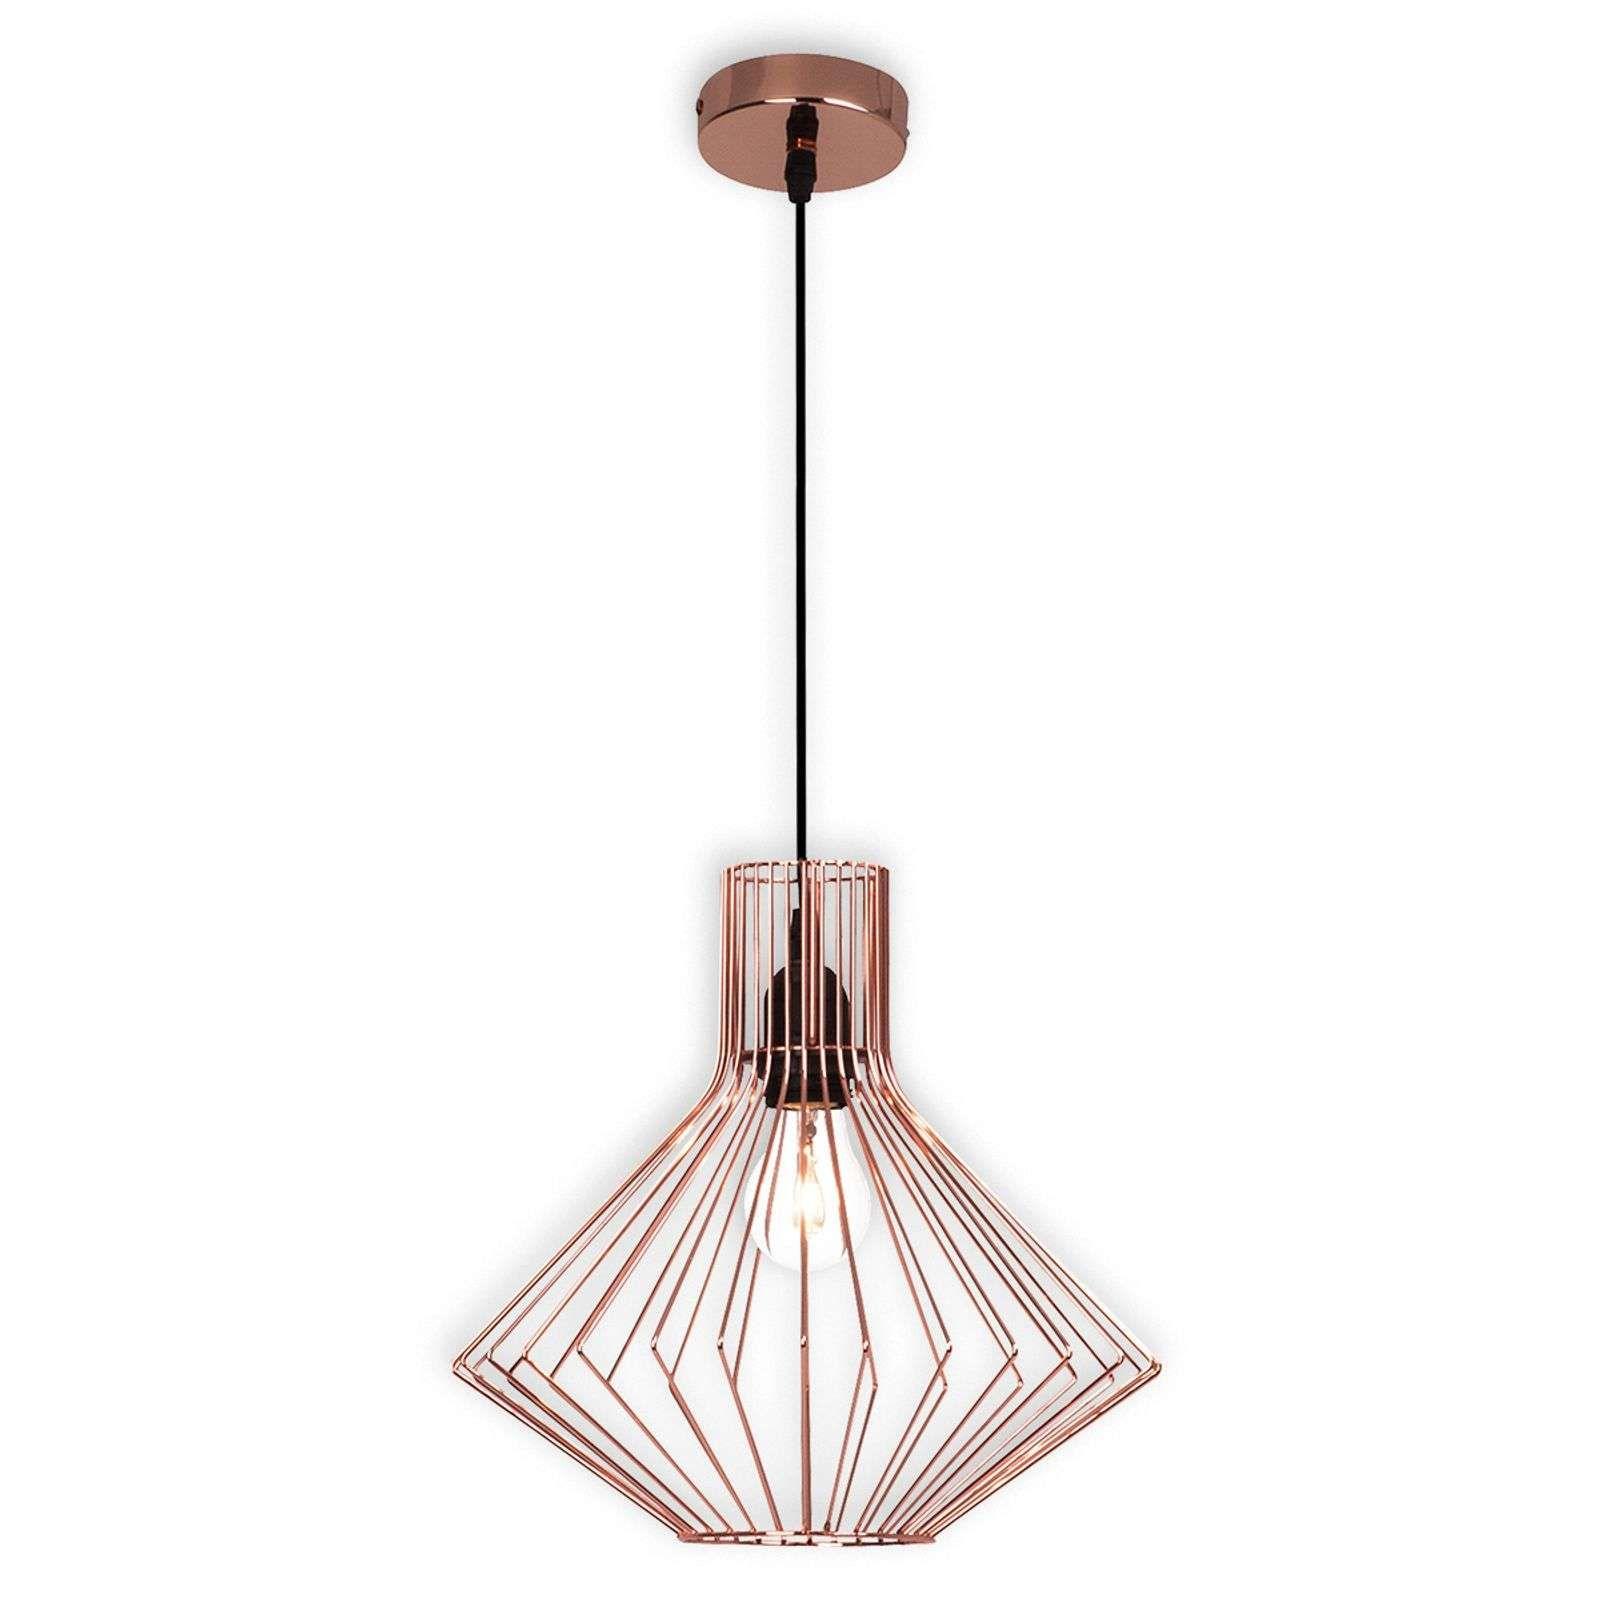 Suspension Cage Dalma En Cuivre De Brilliant Petites Lampes De